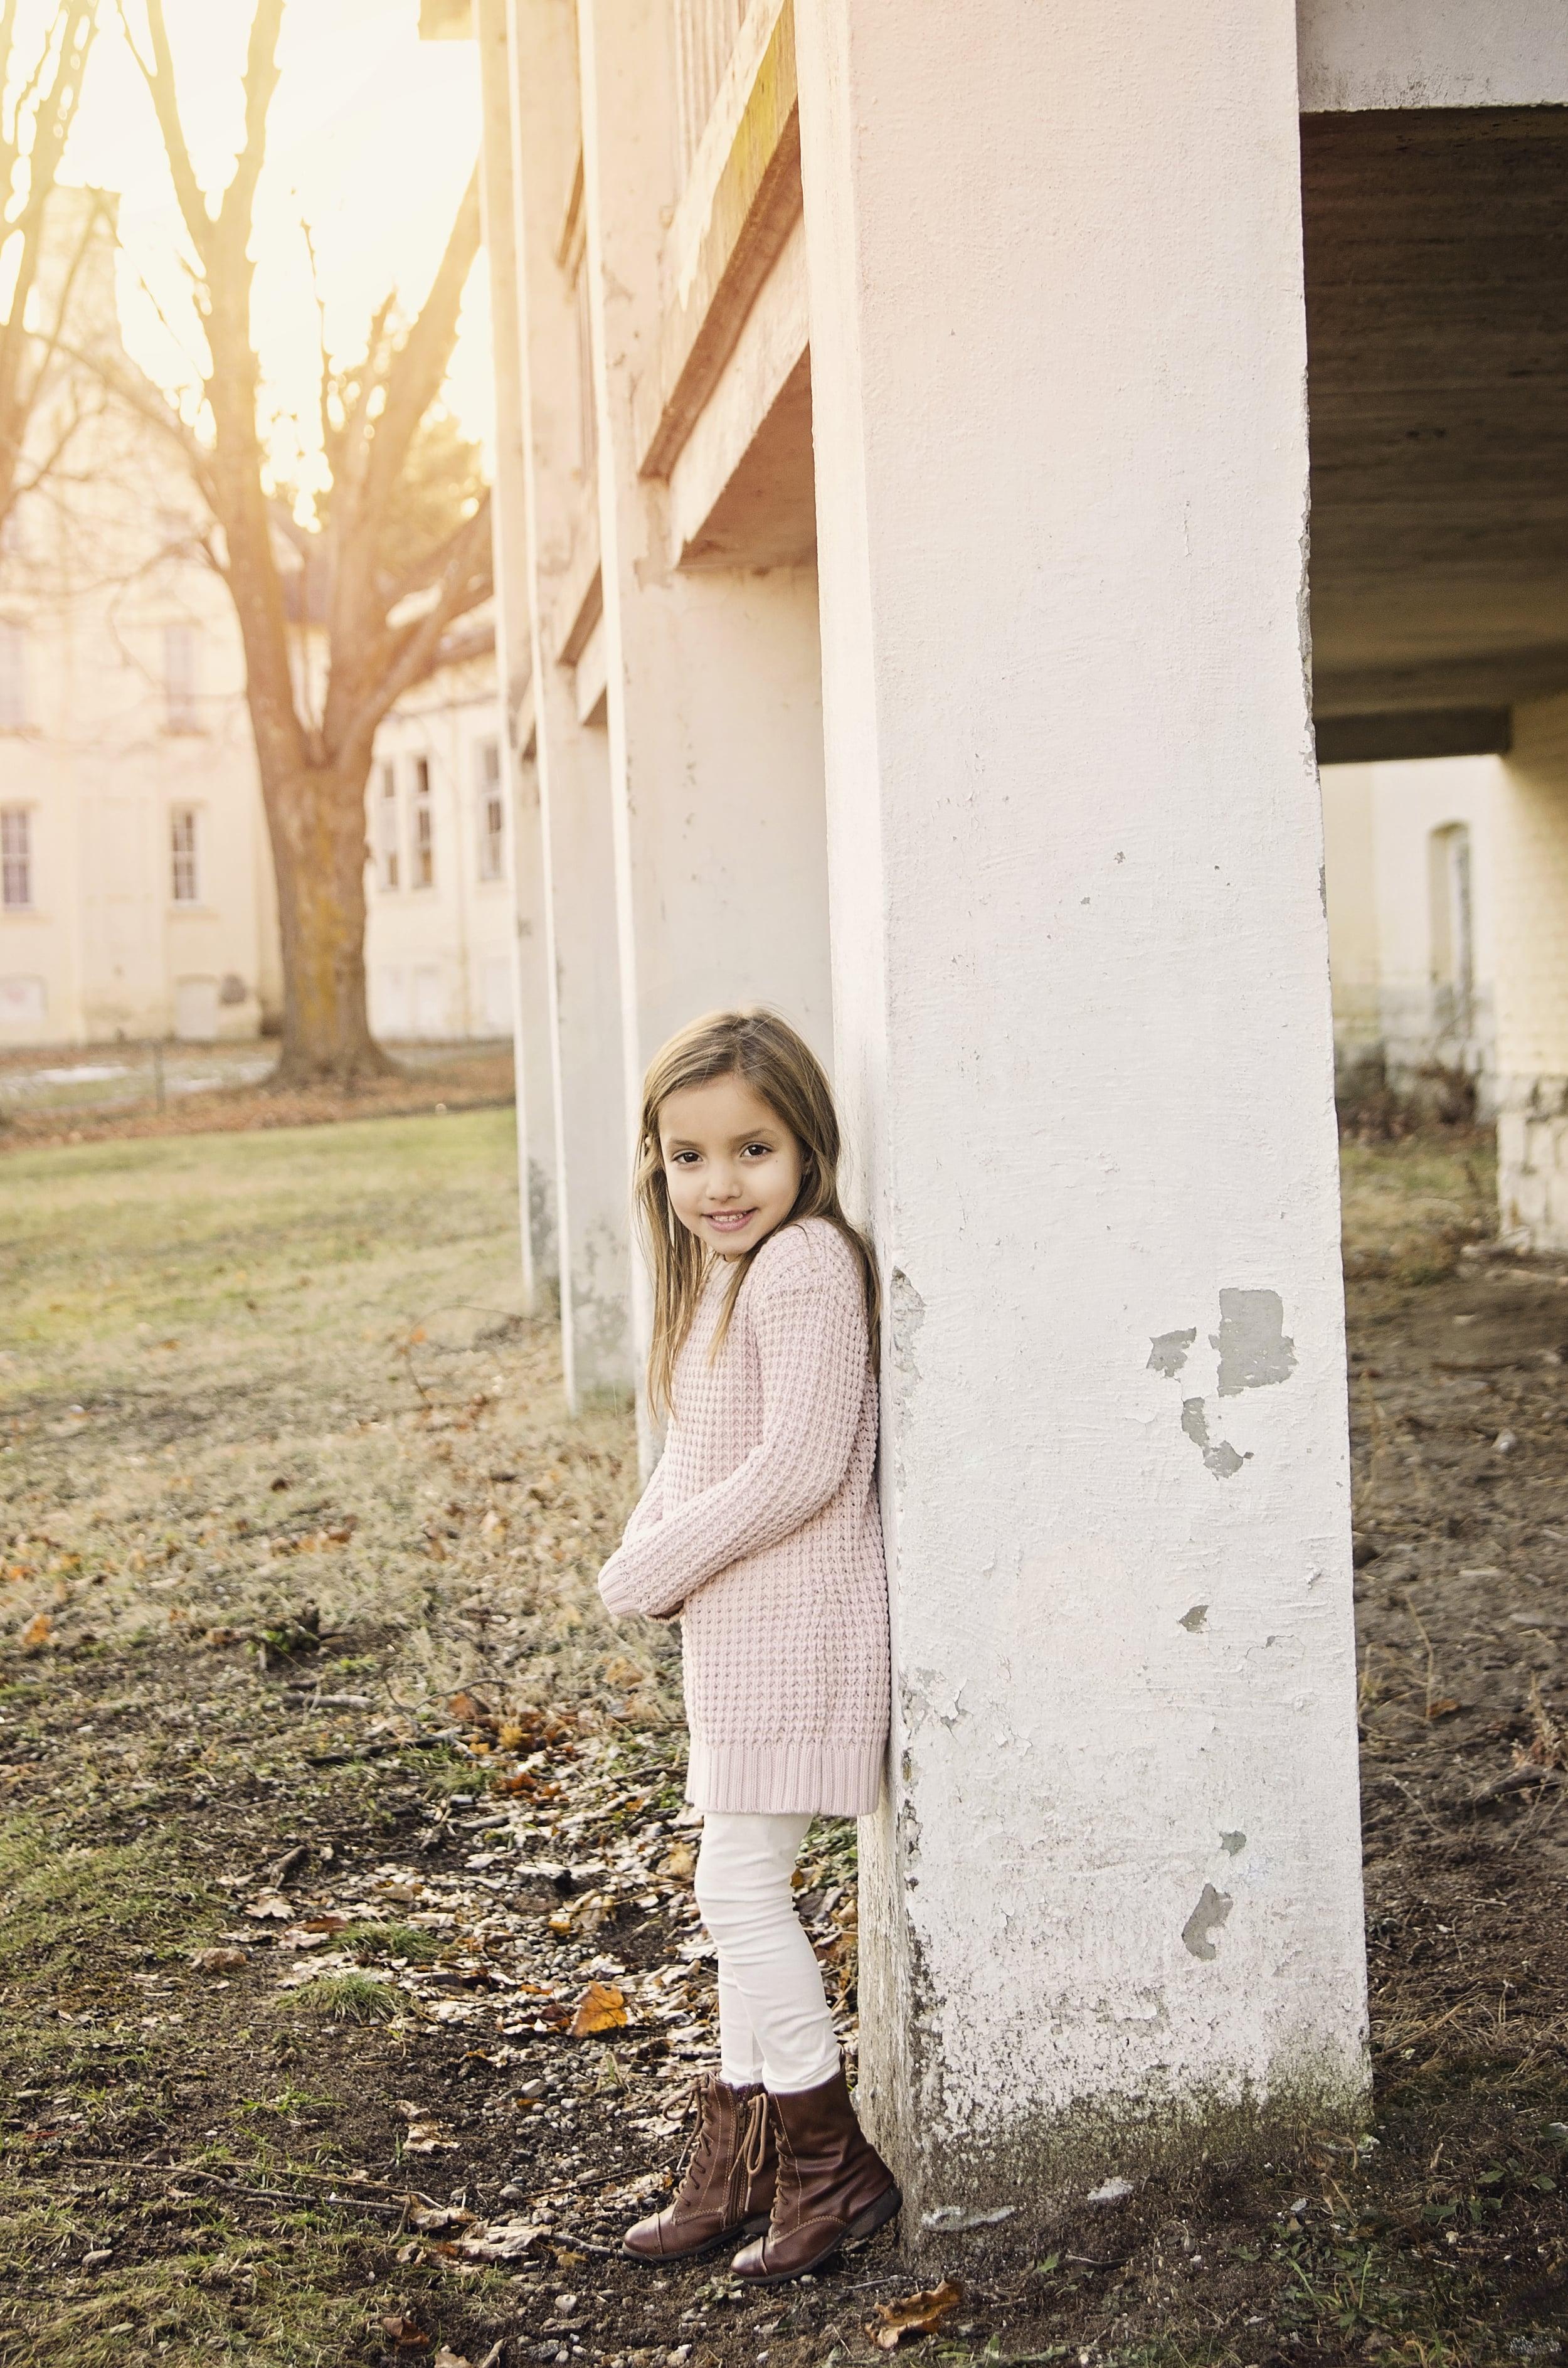 All Images 2012-2016 © Copyright Hannah Lamitina Photography